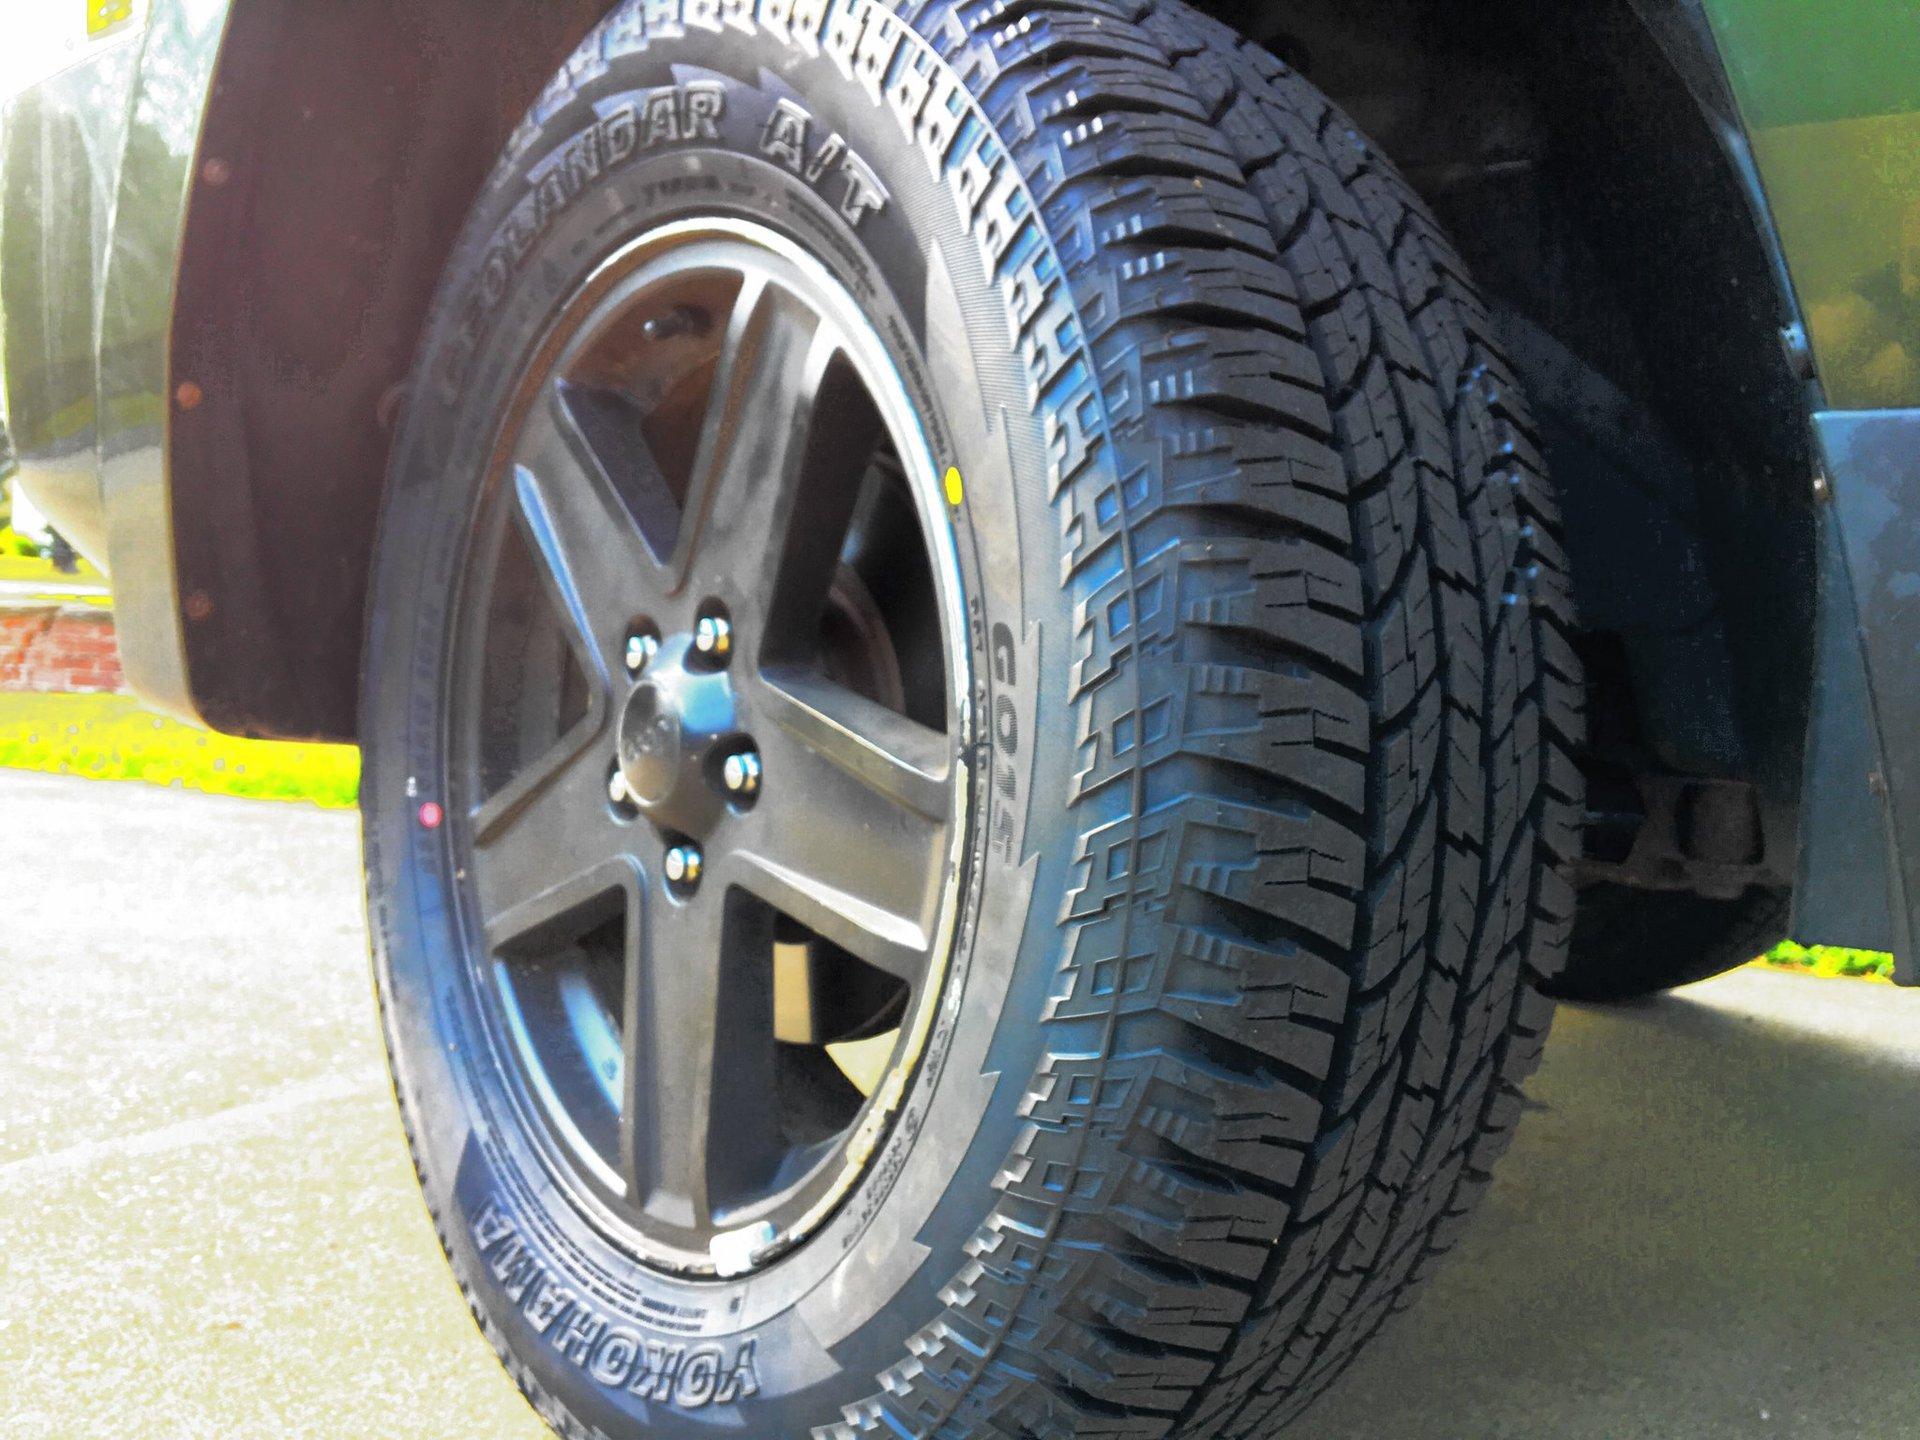 New Yokohama Geolandar AT G015 Tires | Jeep Patriot Forums